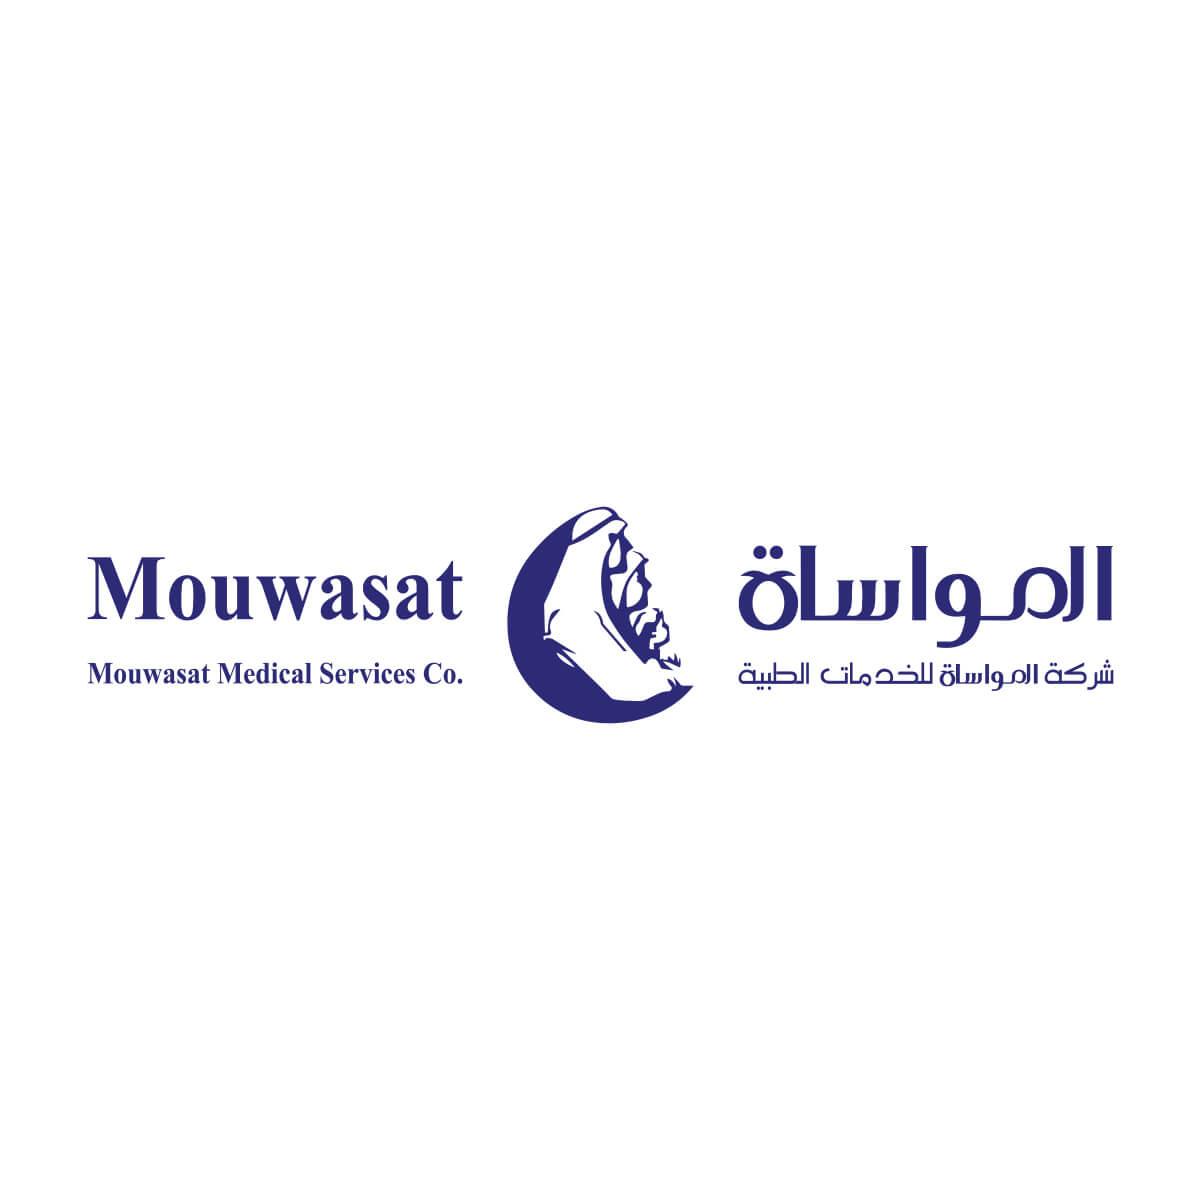 Mouwasat Medical Services*